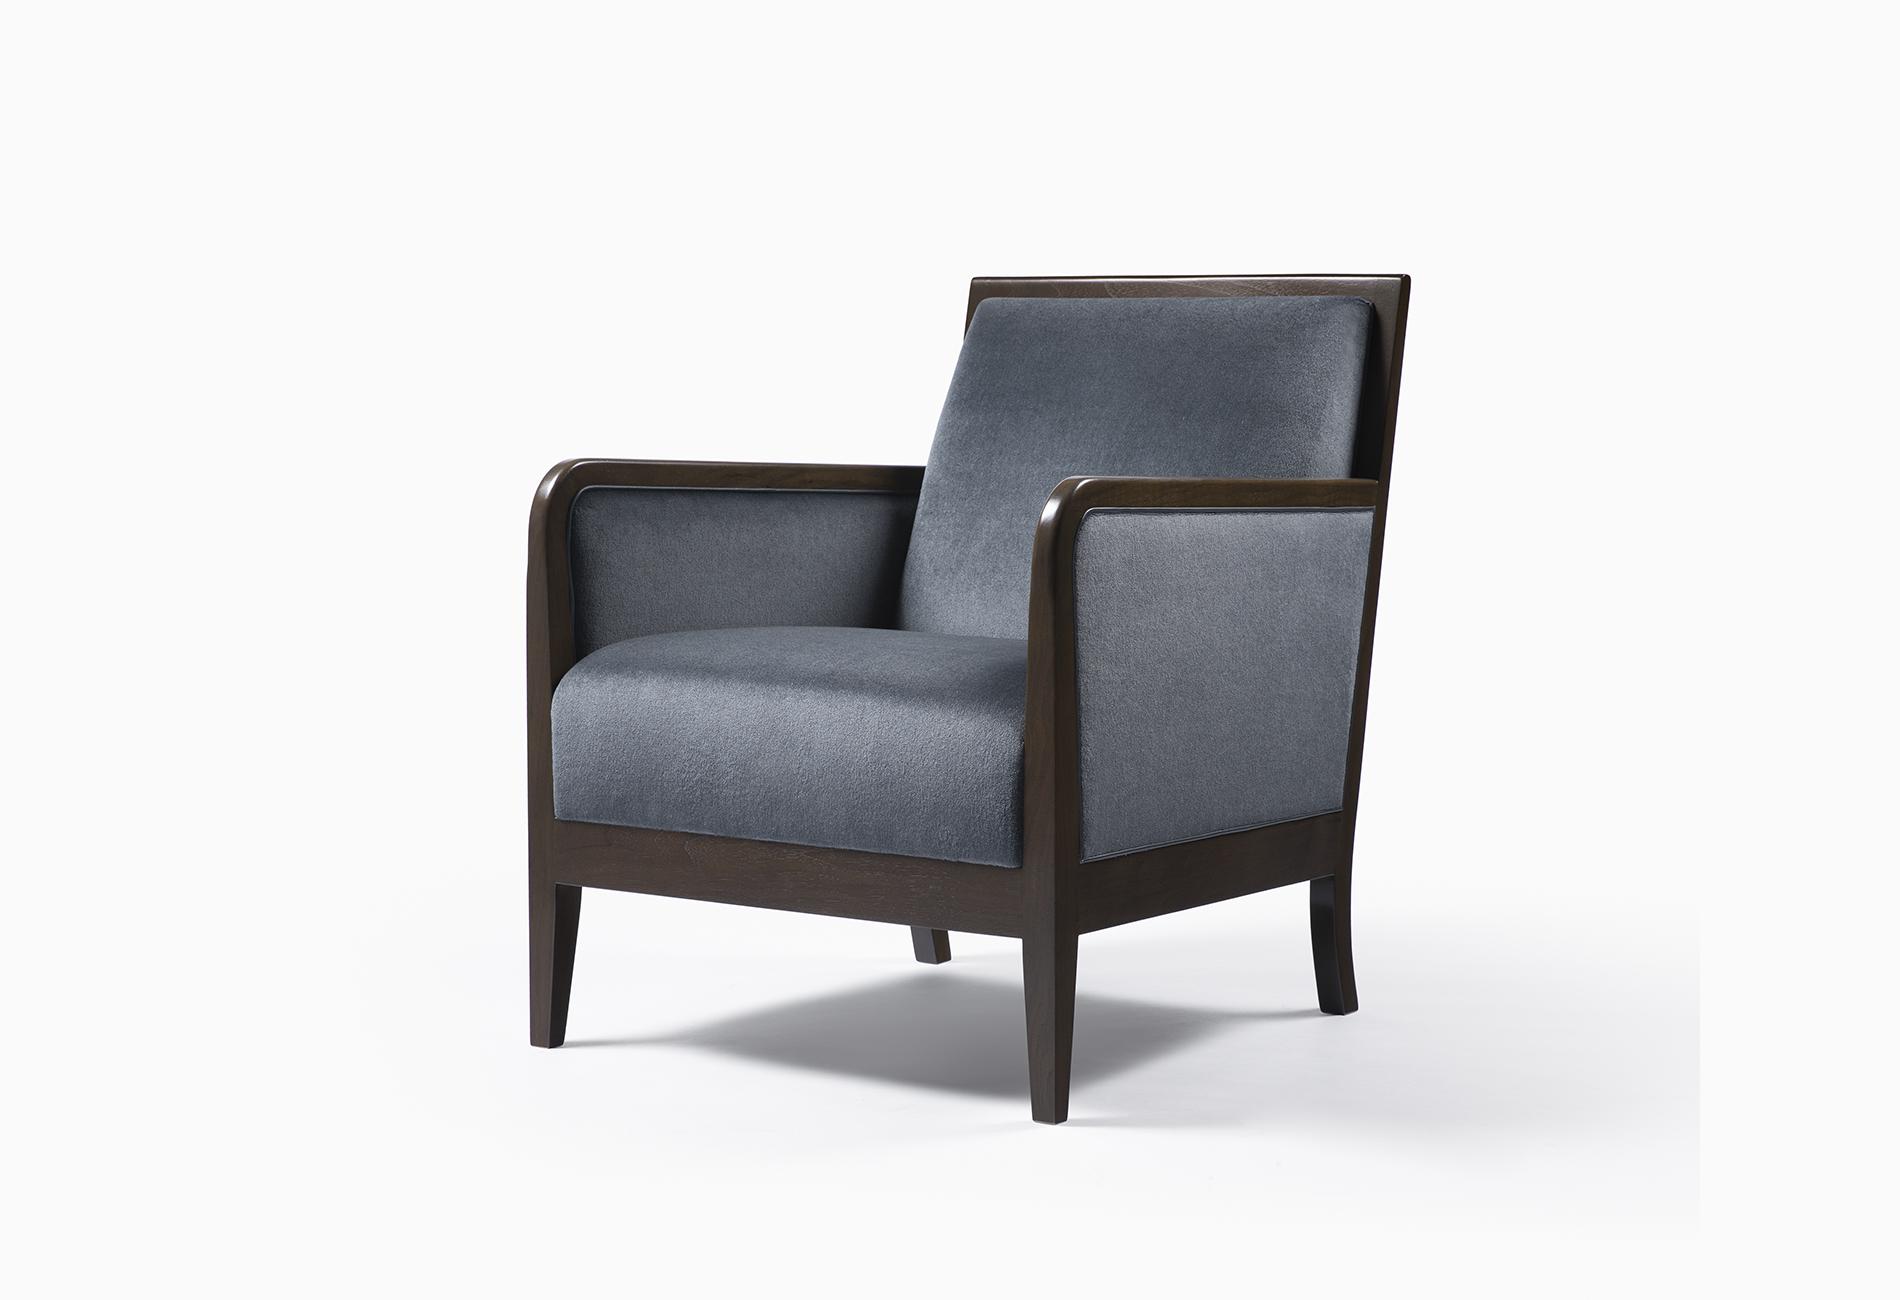 CMS Triumph Lounge Chair (1)_Revised.jpg